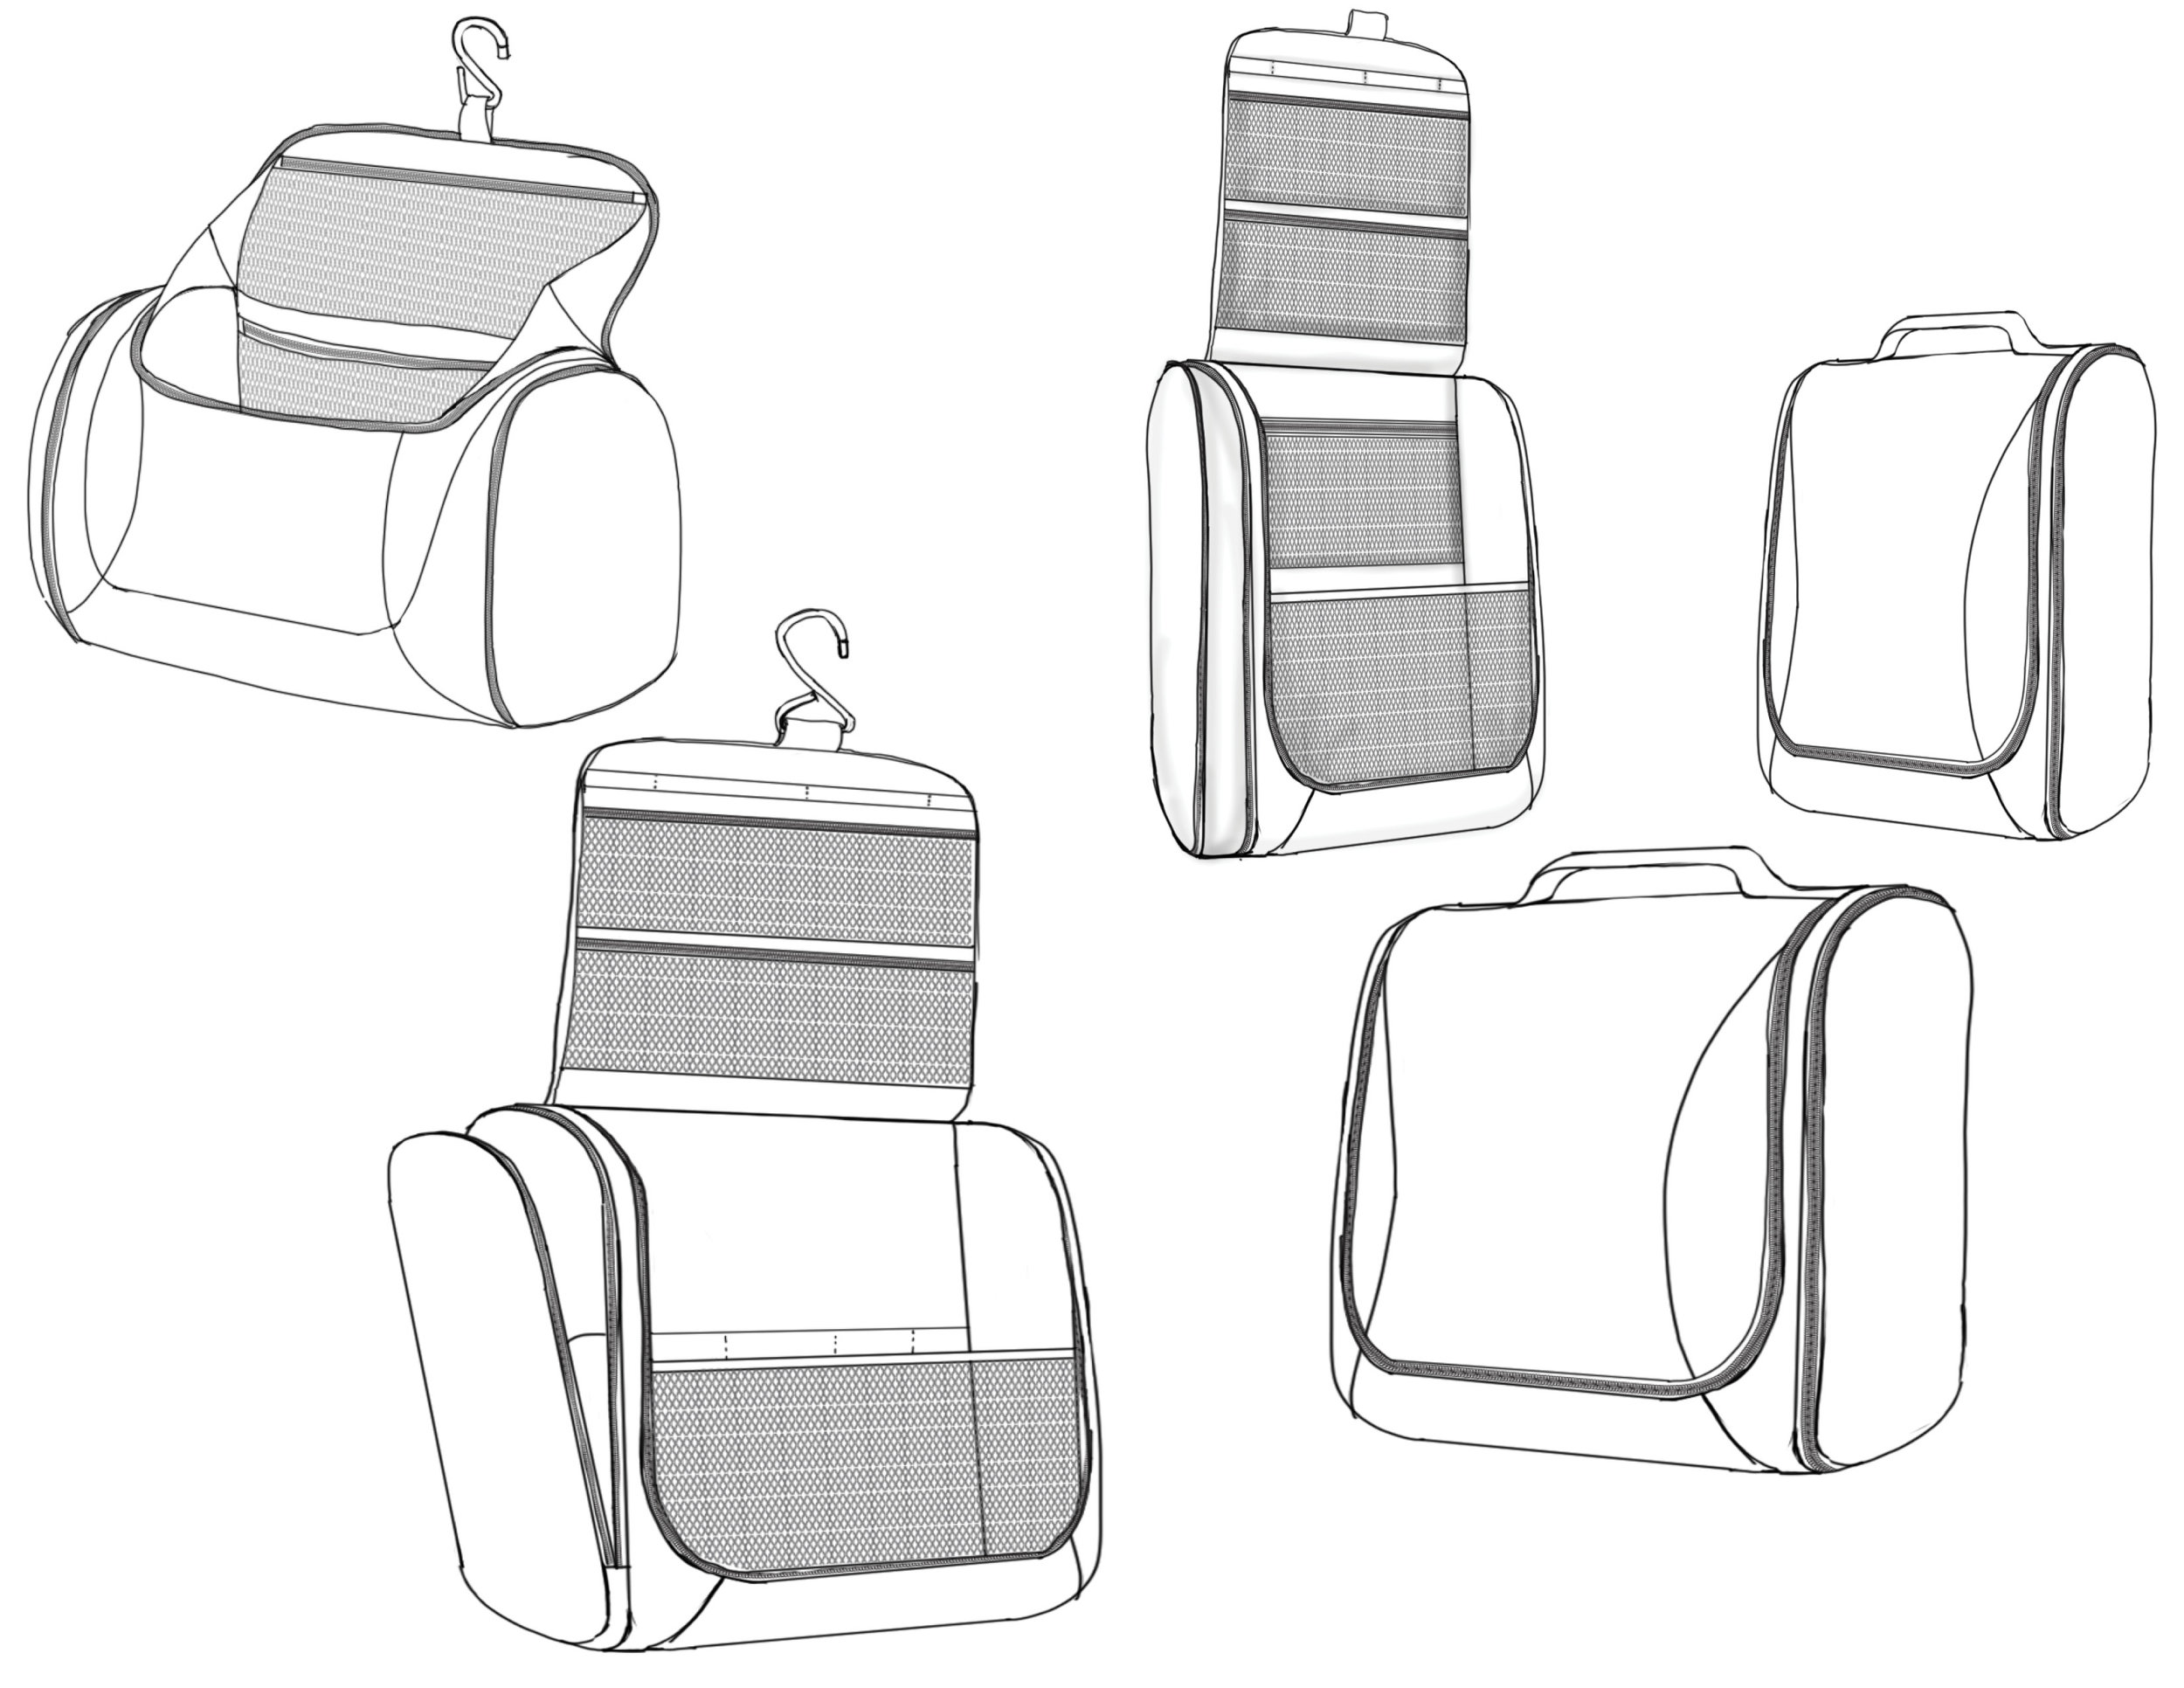 Initial sketches explore organizational options.